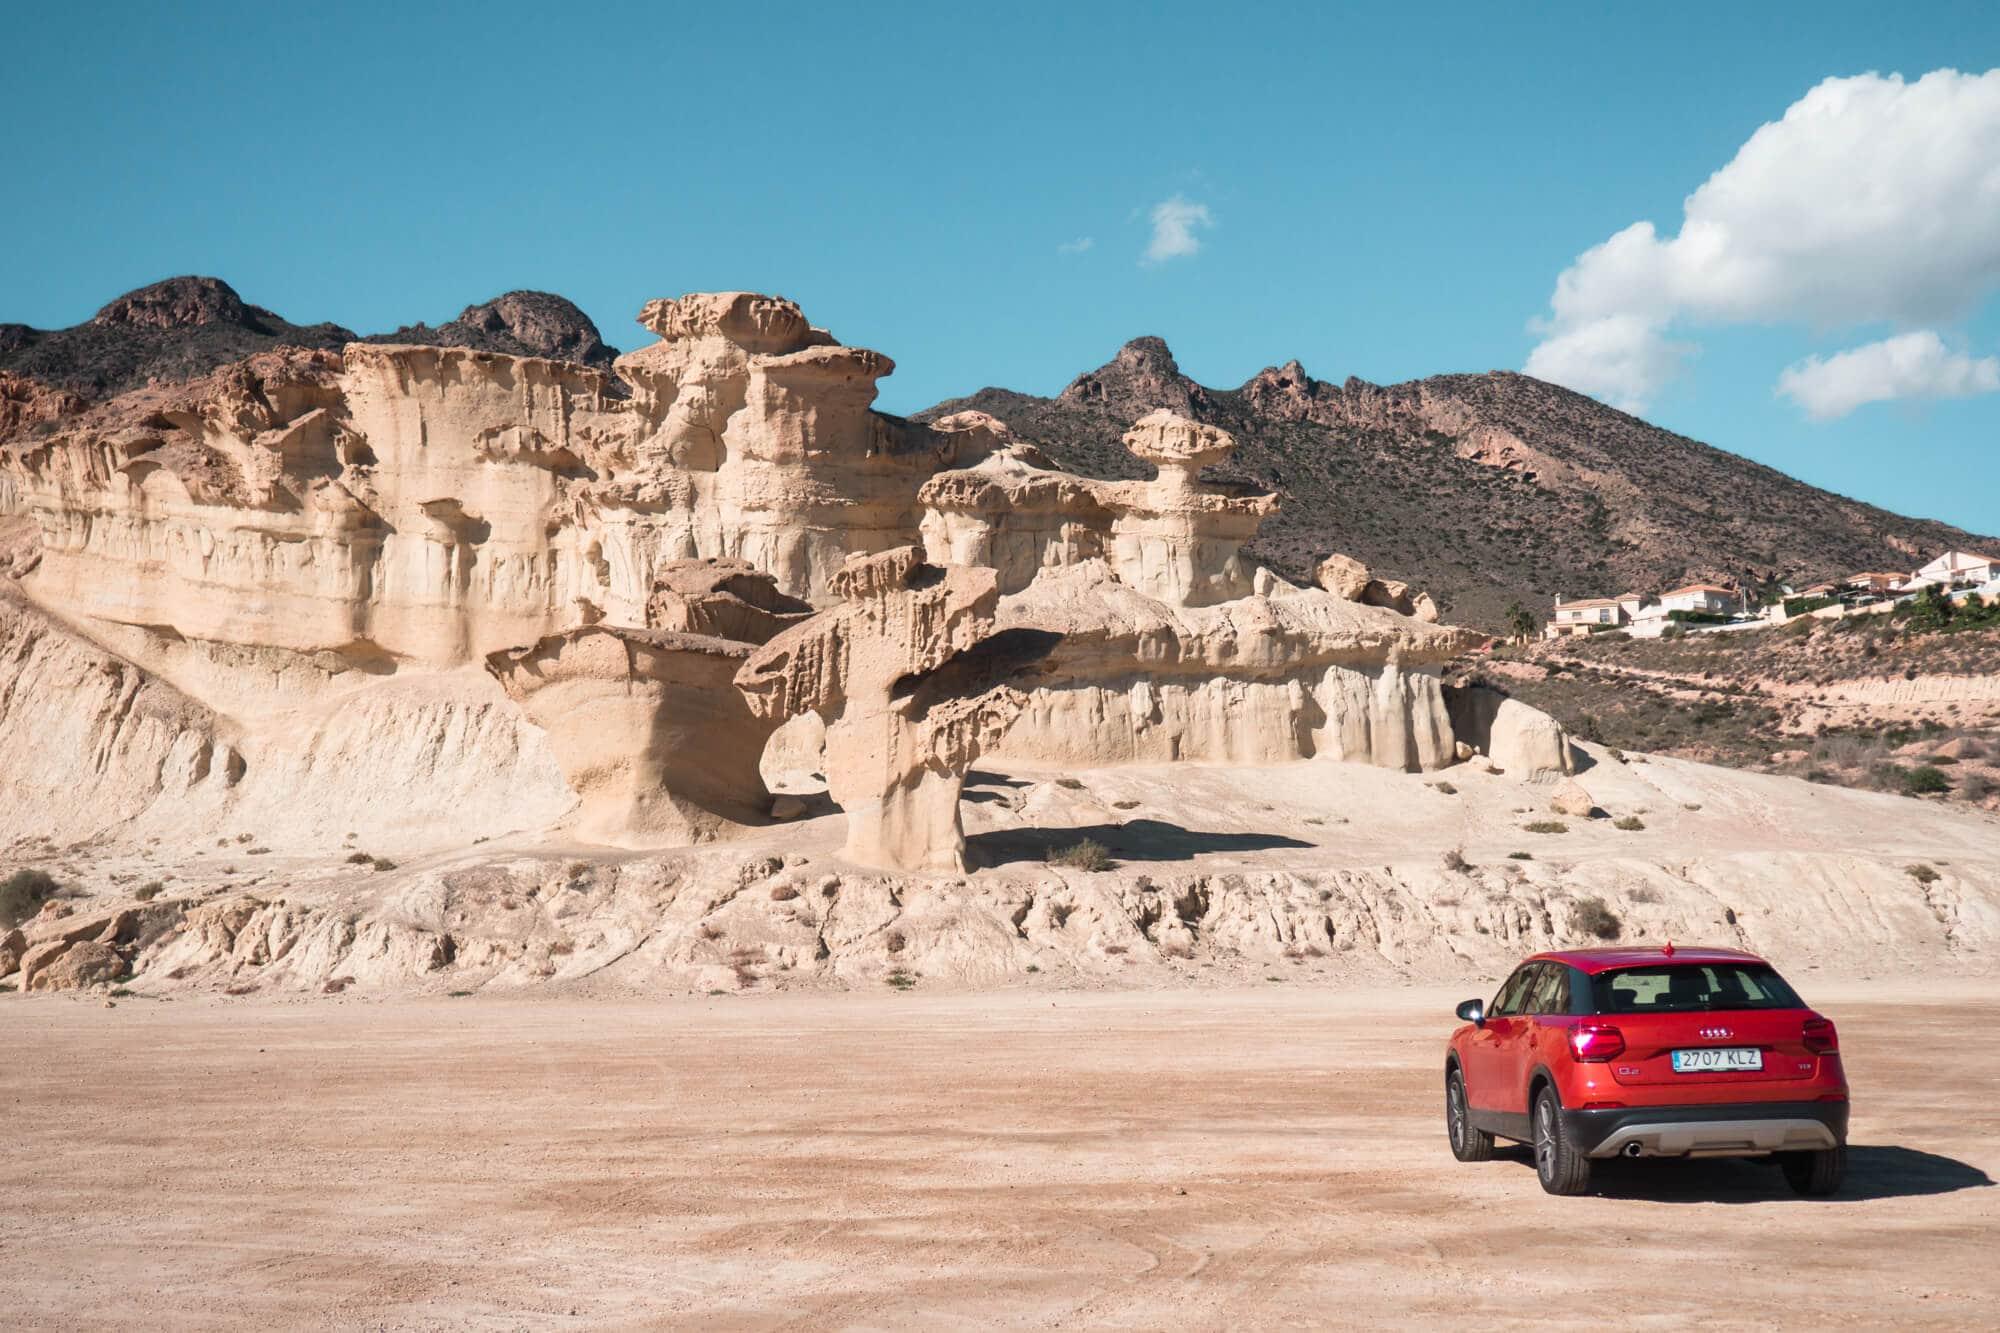 Las Gredas de Bolnuevo, also known as Ciudad Encantada - An otherworldly landscape of eroded sandstone formations in Bolnuevo, Murcia, Spain